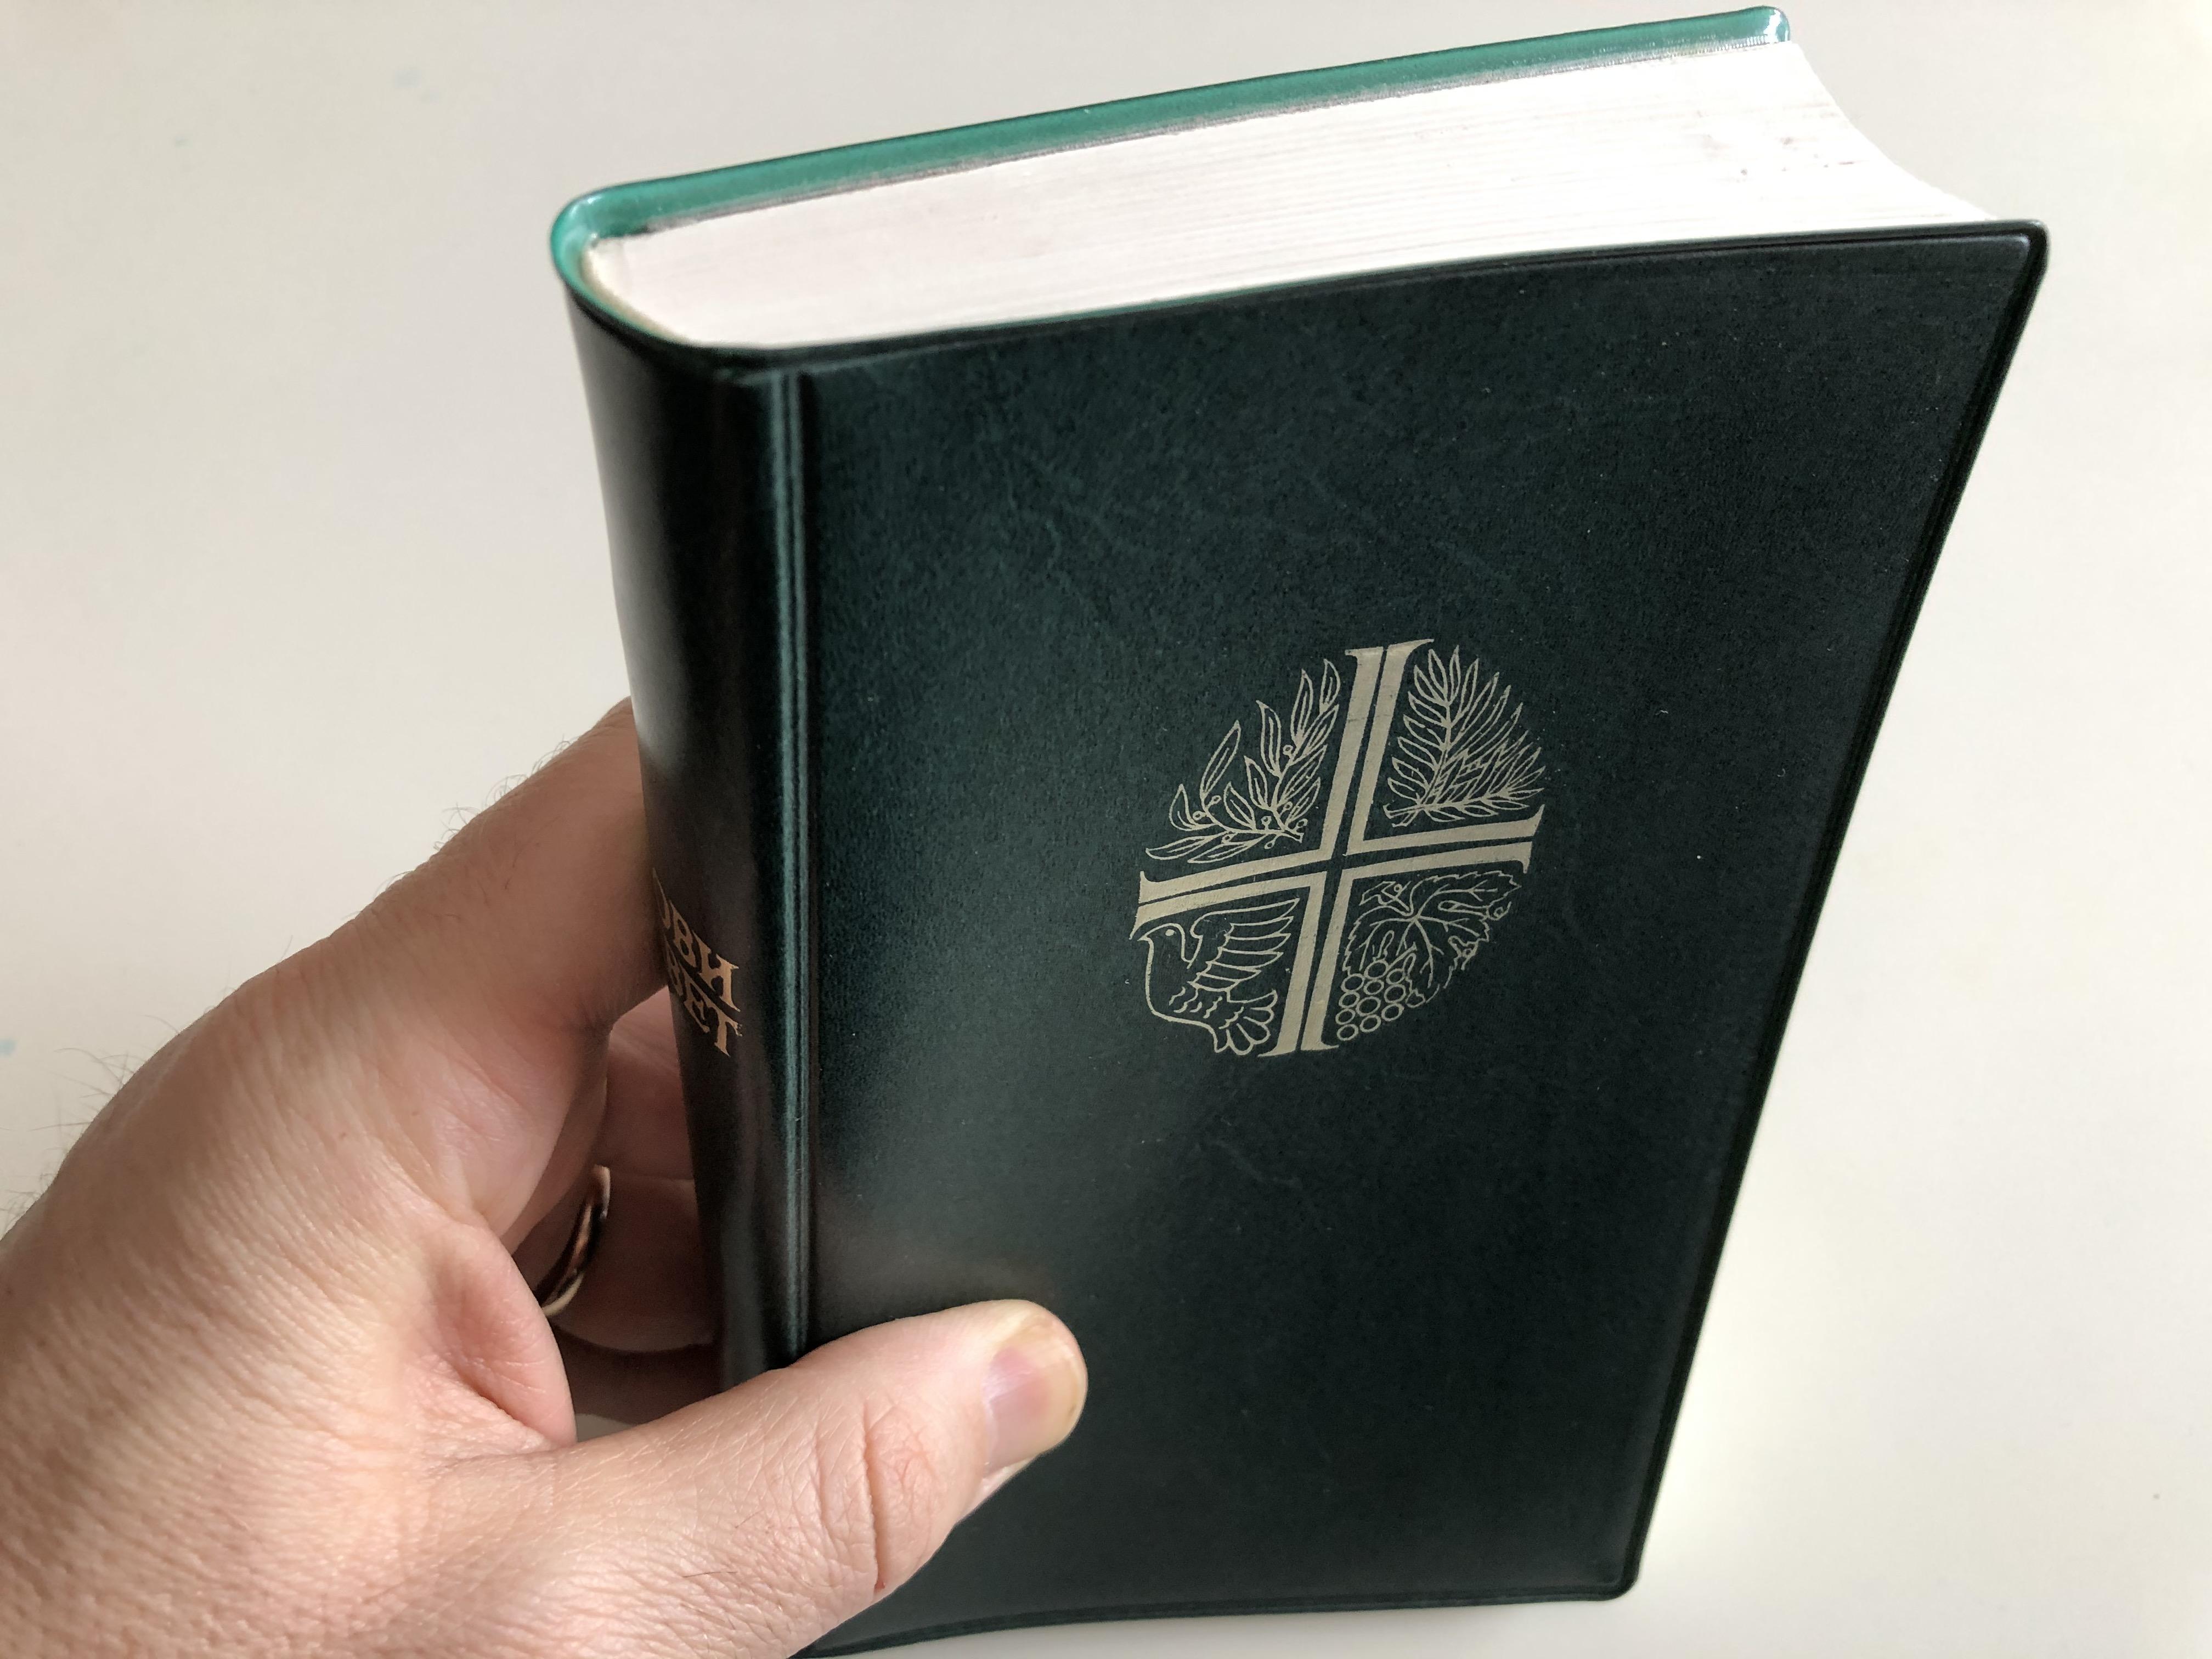 serbian-new-testament-novi-zavet-emilijan-m.-arni-21.jpg